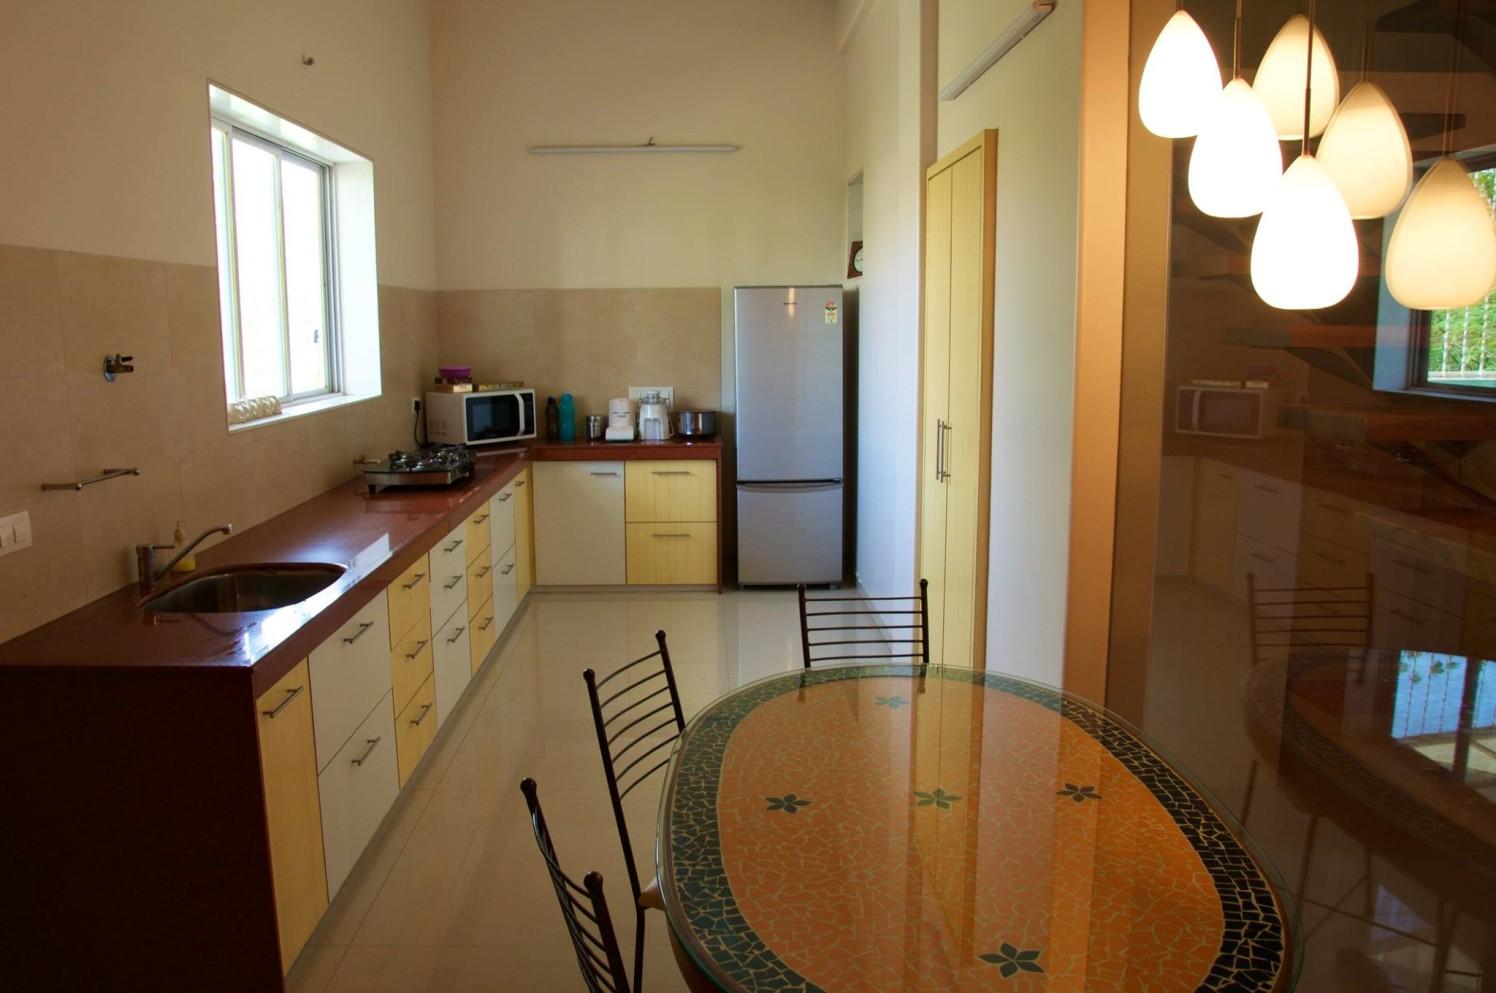 Modular Kitchen by Design Kkarma Modular-kitchen Minimalistic | Interior Design Photos & Ideas